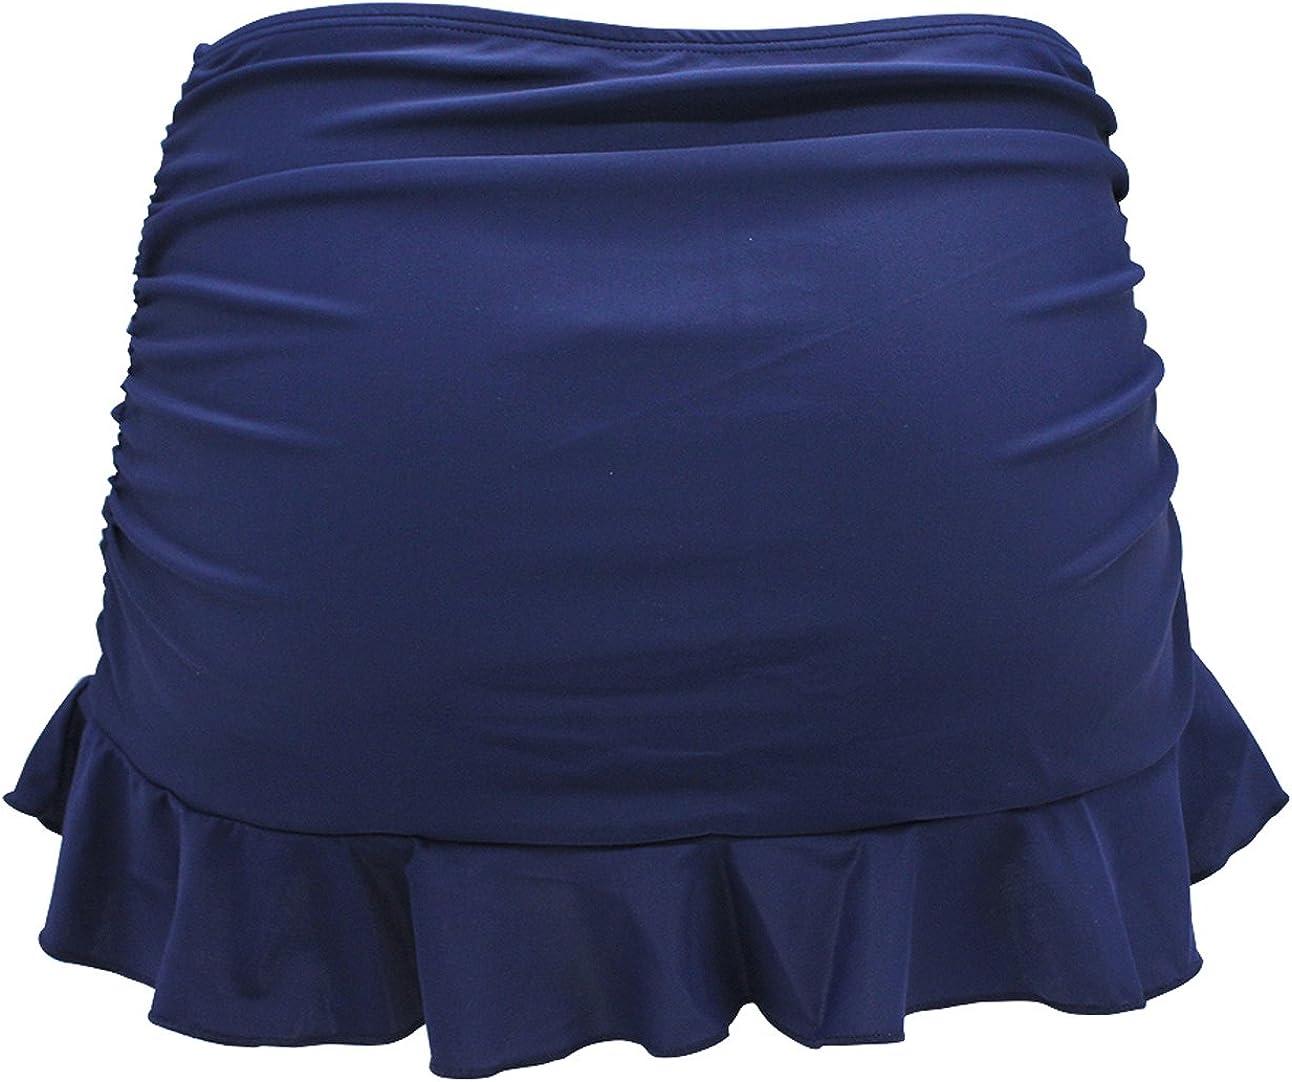 SHEKINI Bikini Bottom for Women Skirted Shorts Ruffle Swimsuit Dress Briefs Swimwear